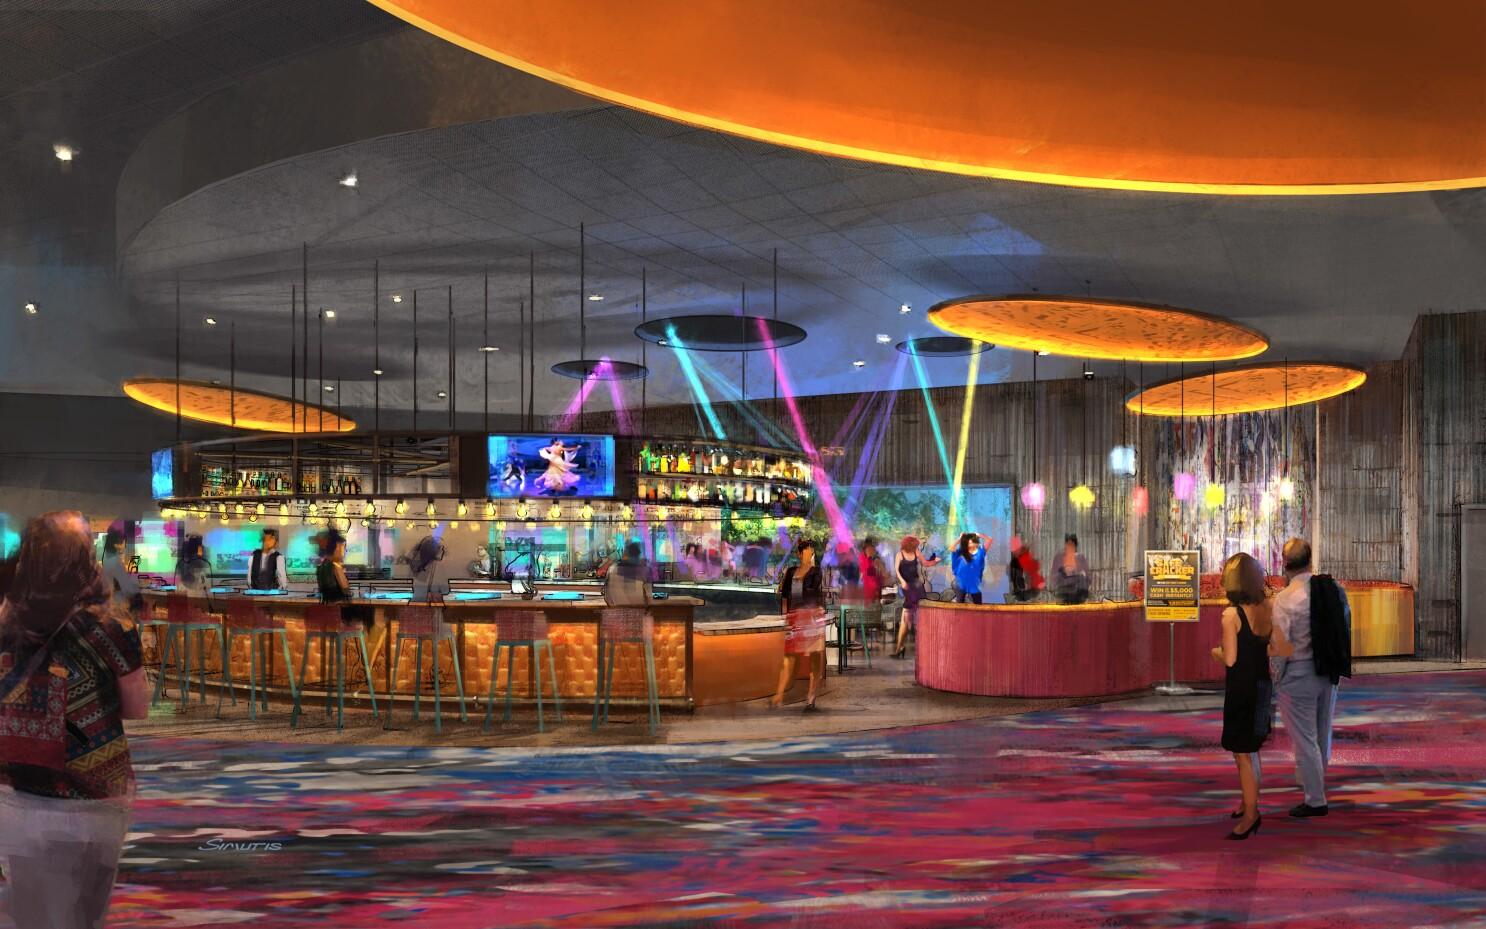 Agua Caliente building new Palms Spring-area casino, 10,000-seat arena; Vegas dining heats up